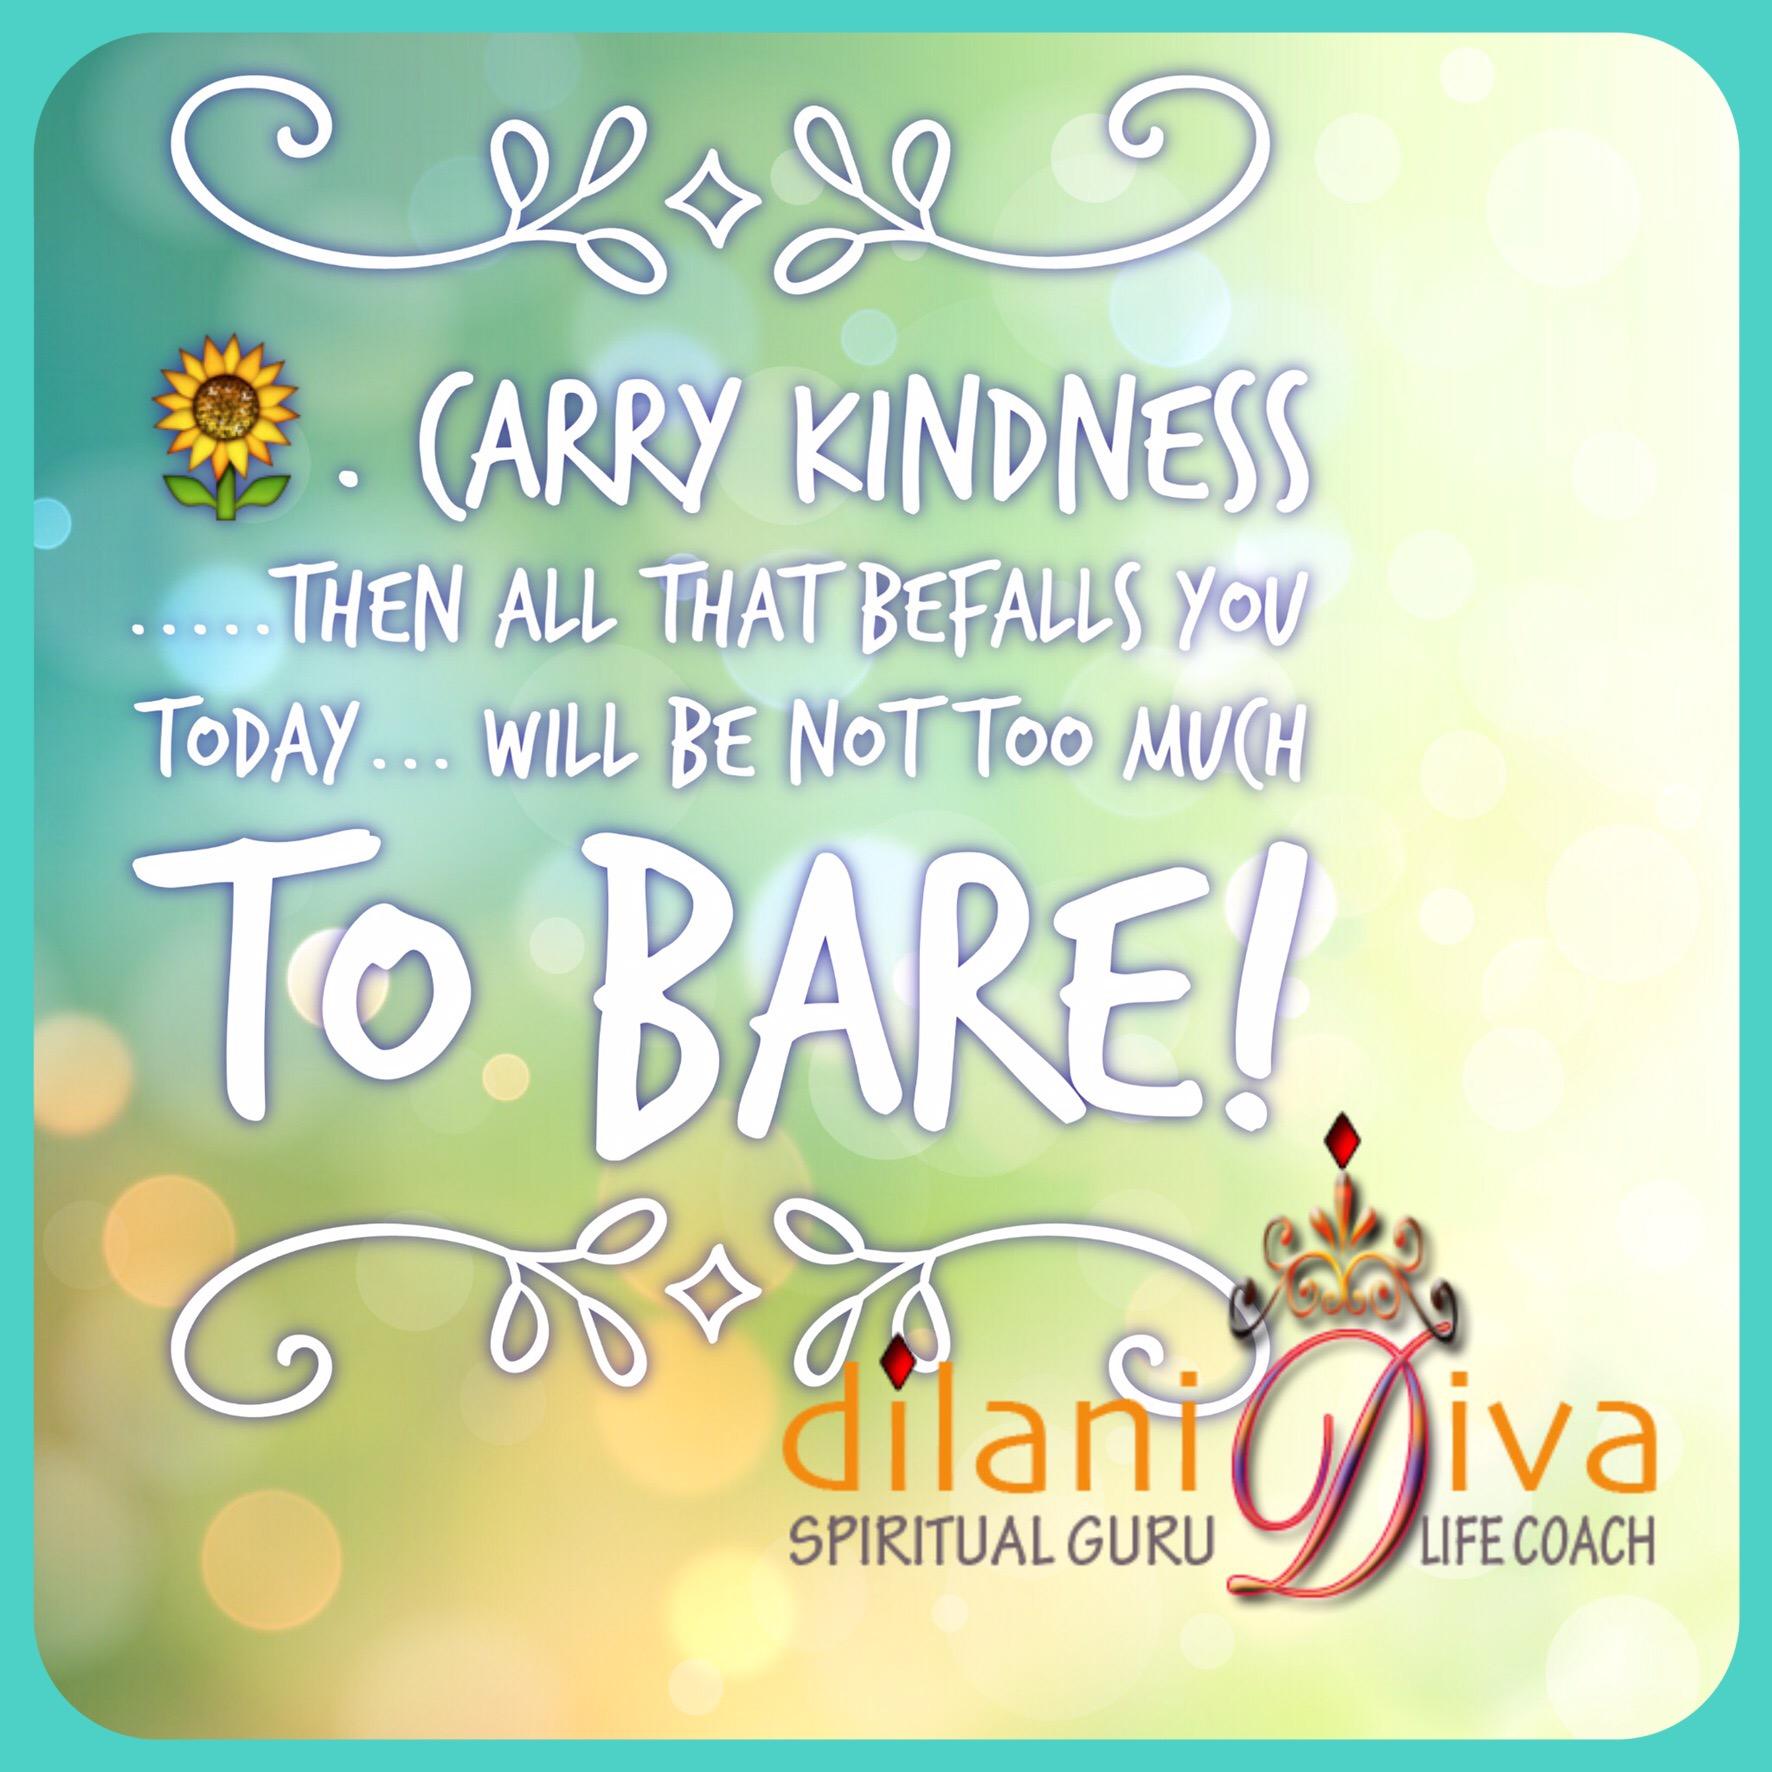 Carry Kindness